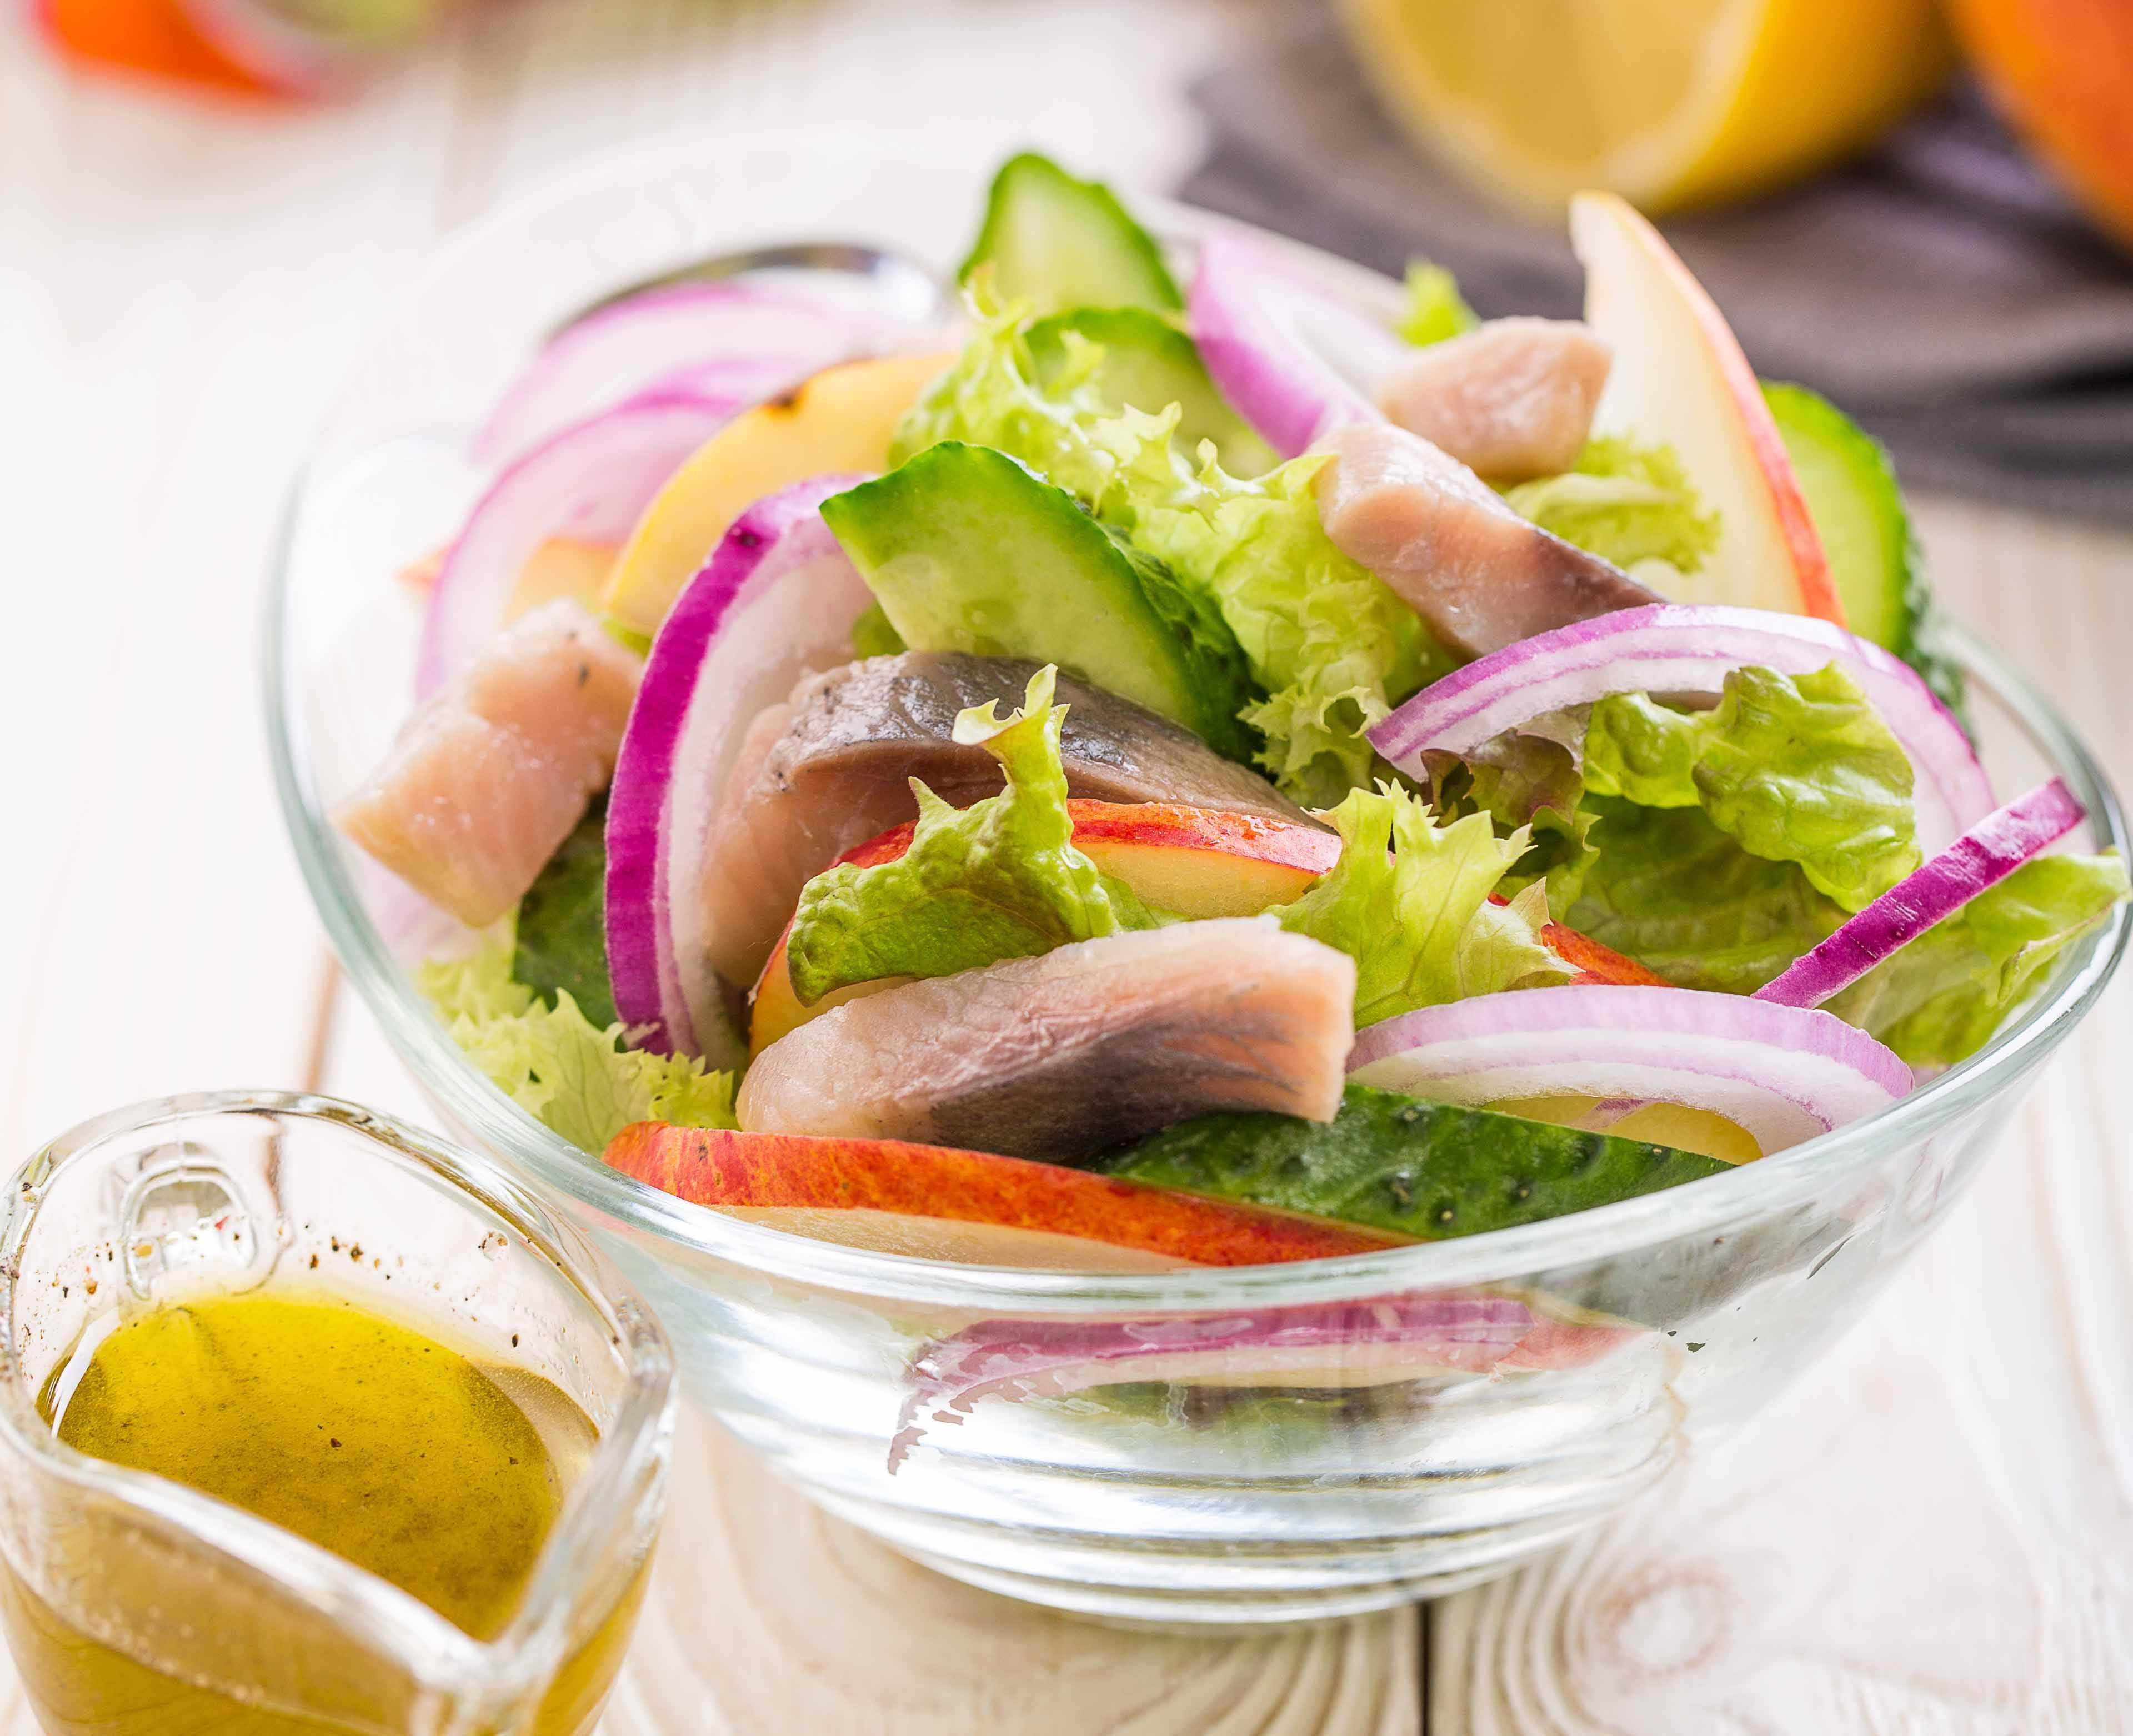 Салат фаворит рецепт с фото пошагово - мир кулинарии